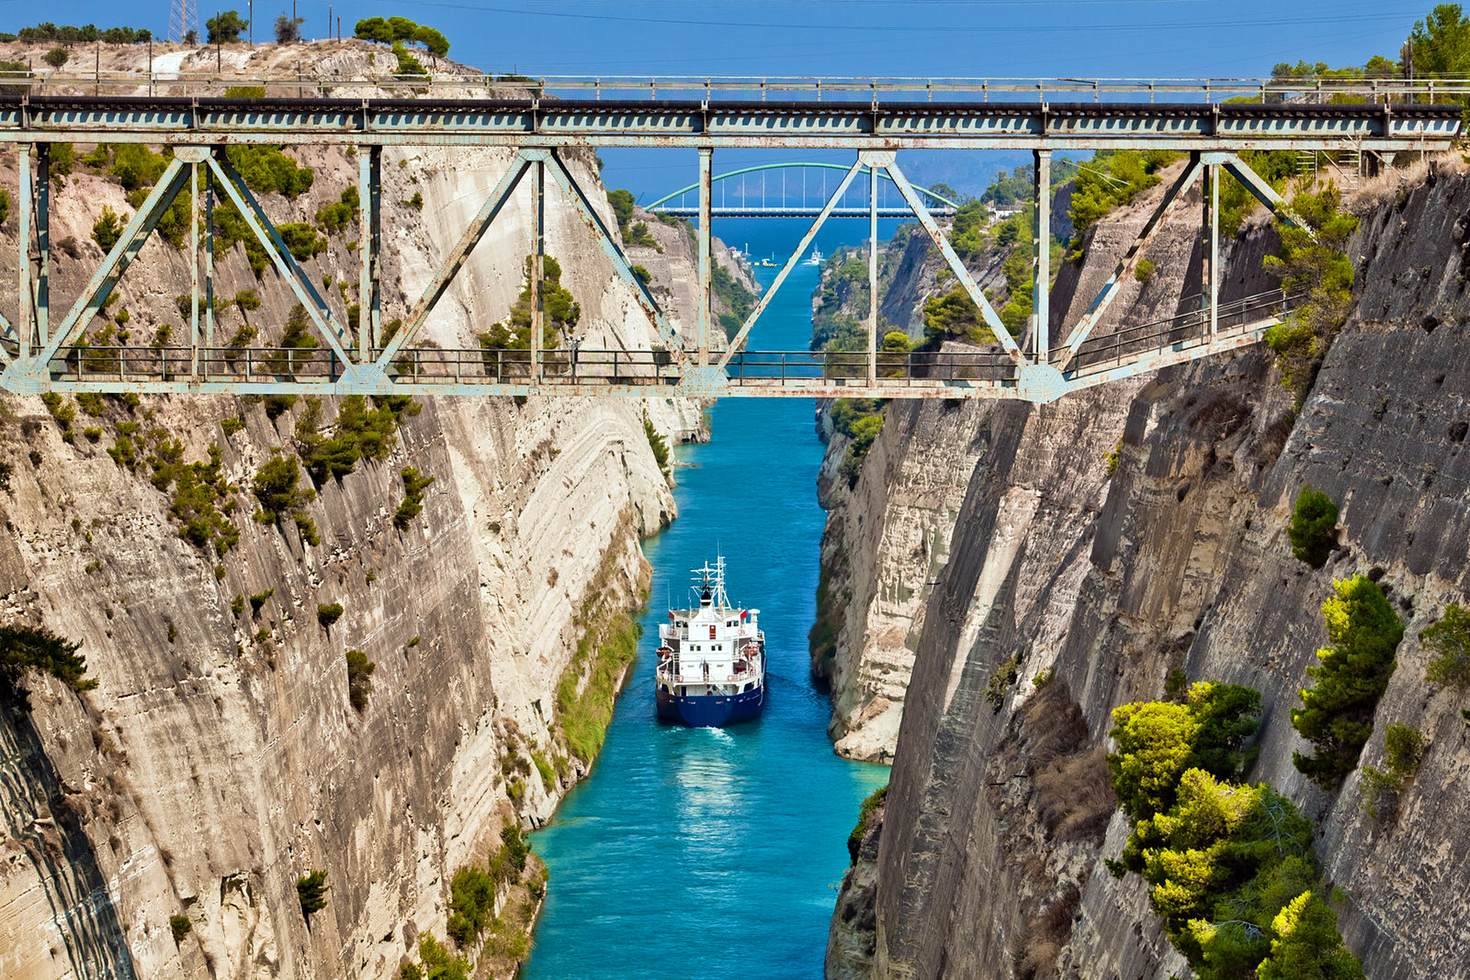 Cross the Corinth Canal to the Nemea wine region